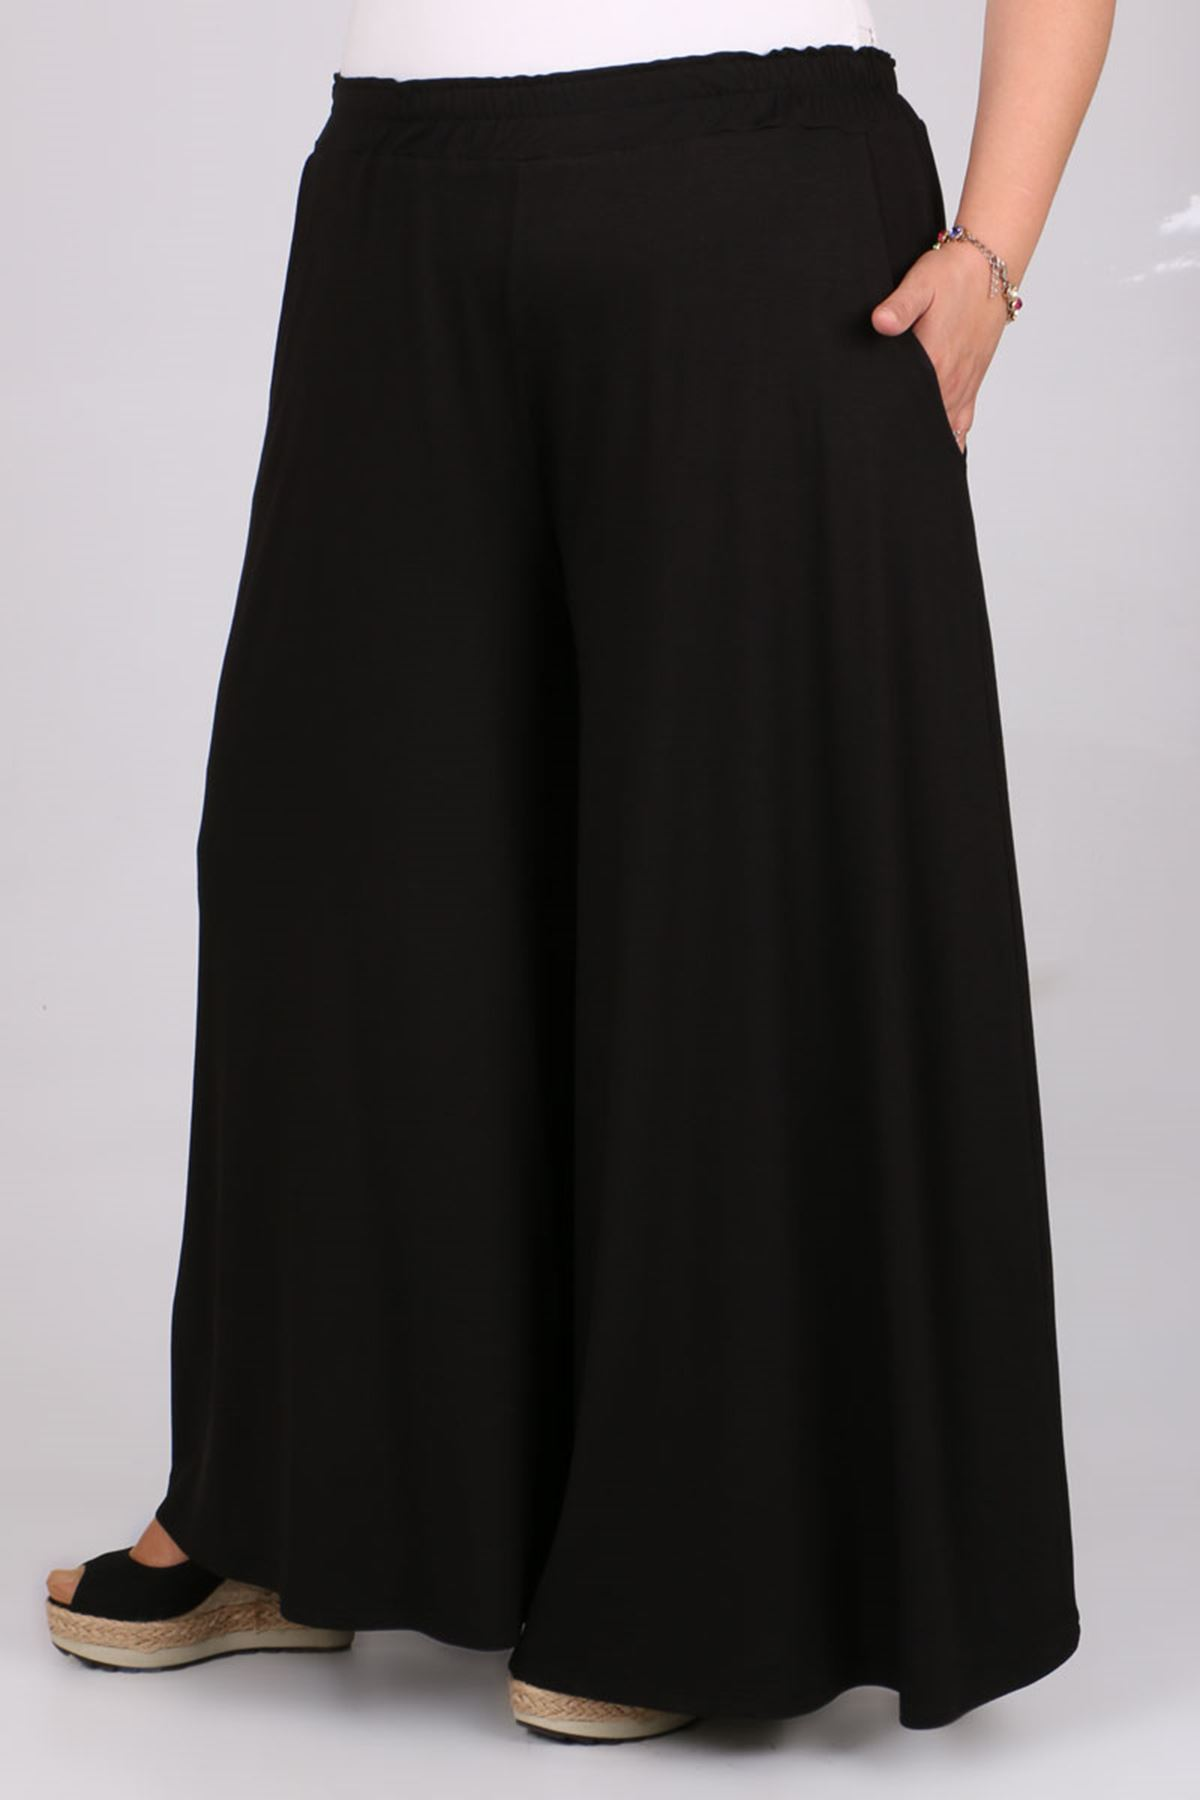 9079 Büyük Beden Penye Geniş Paça Pantolon - Siyah